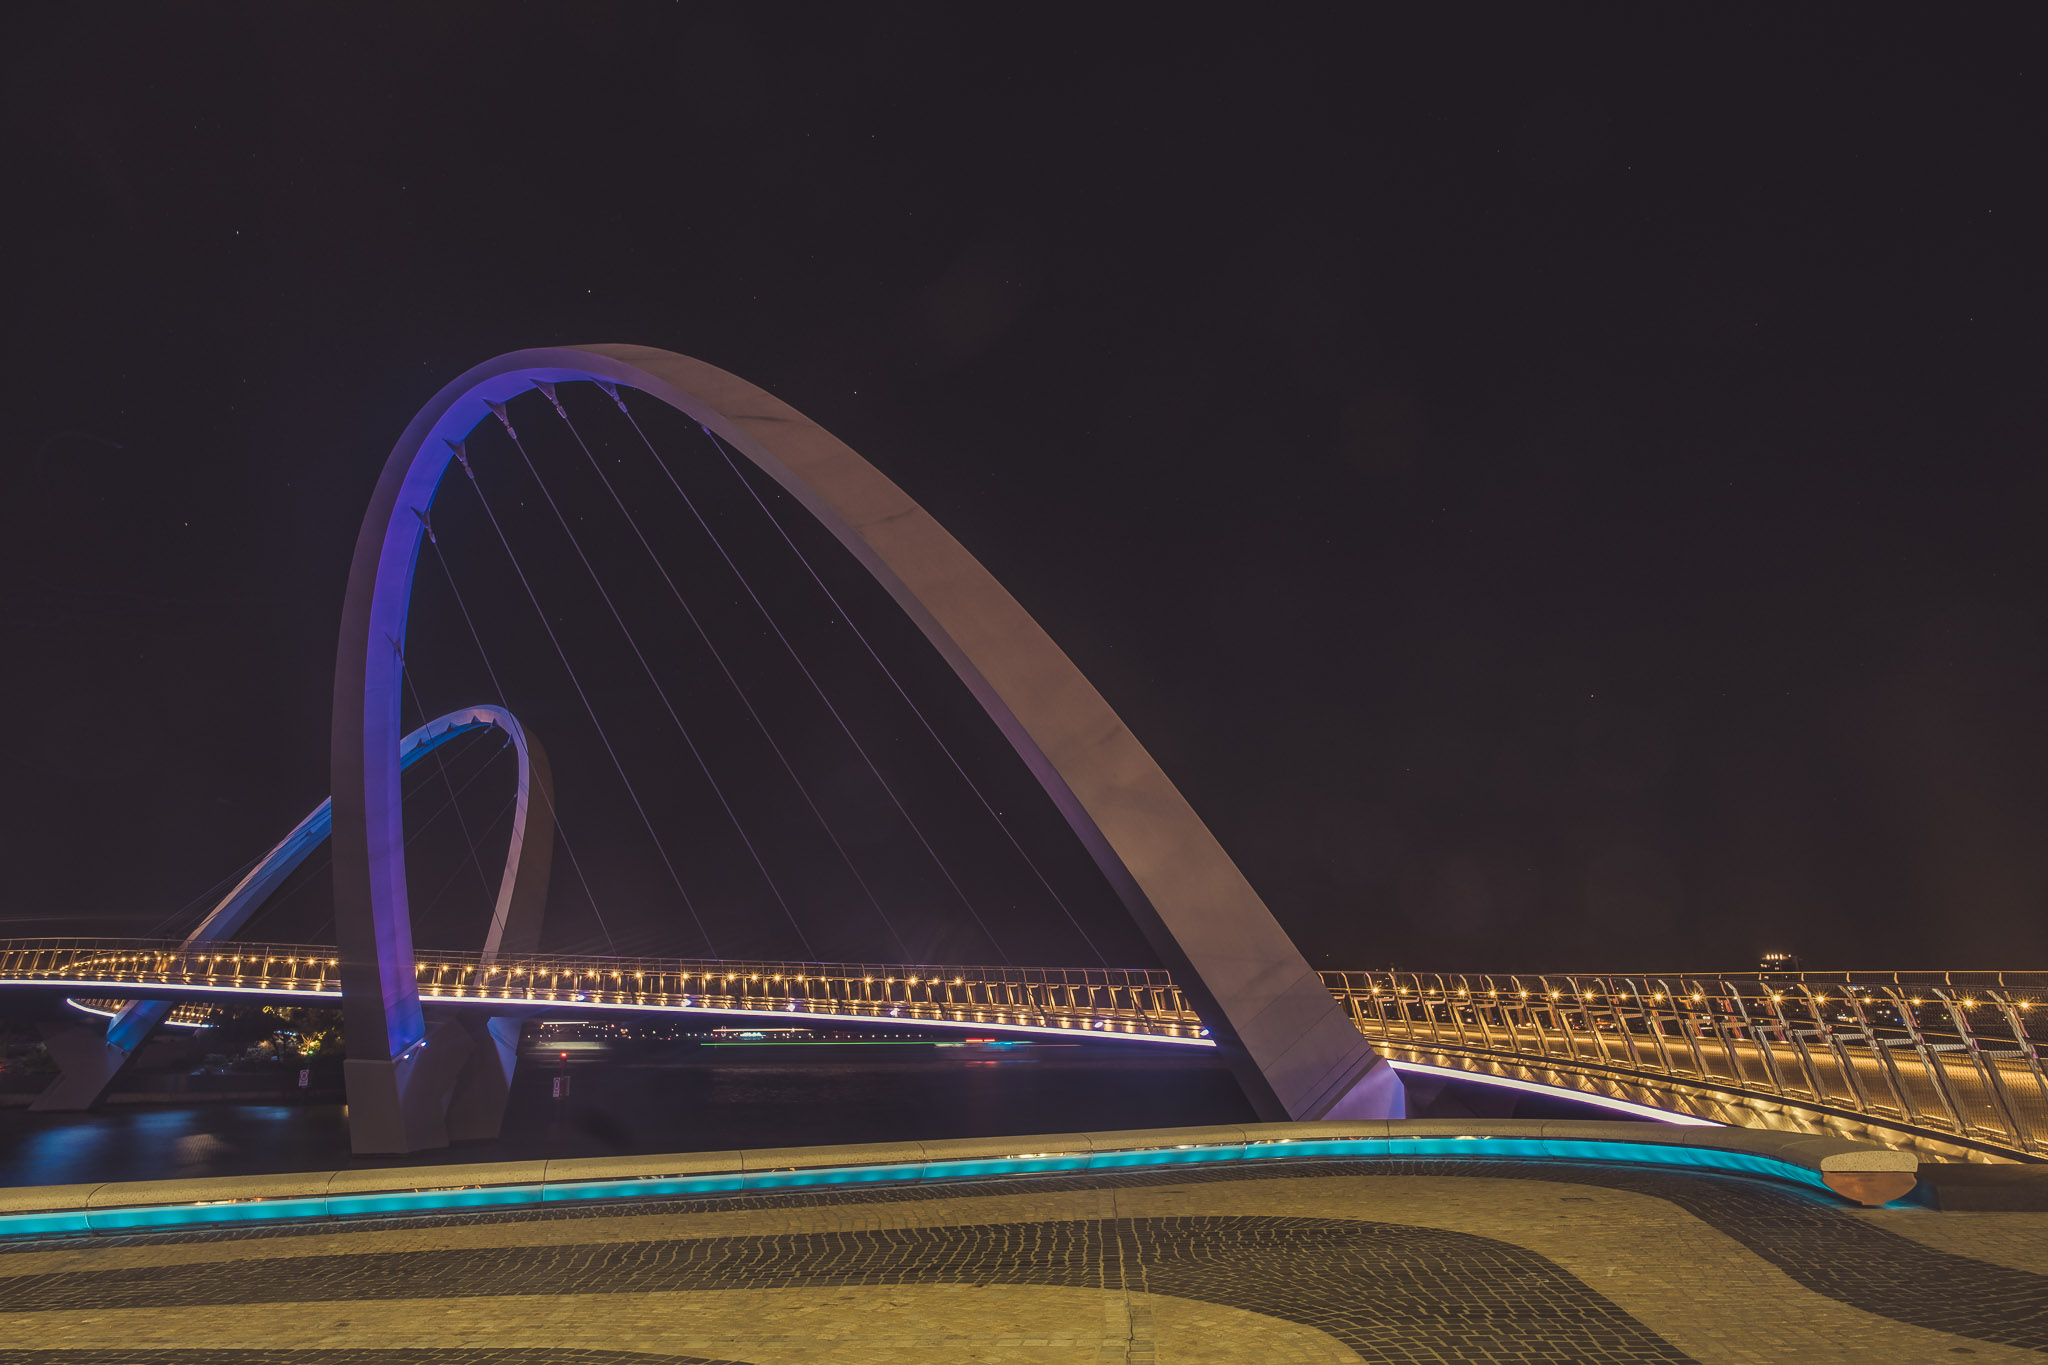 Perth (City) Night Photography Workshop